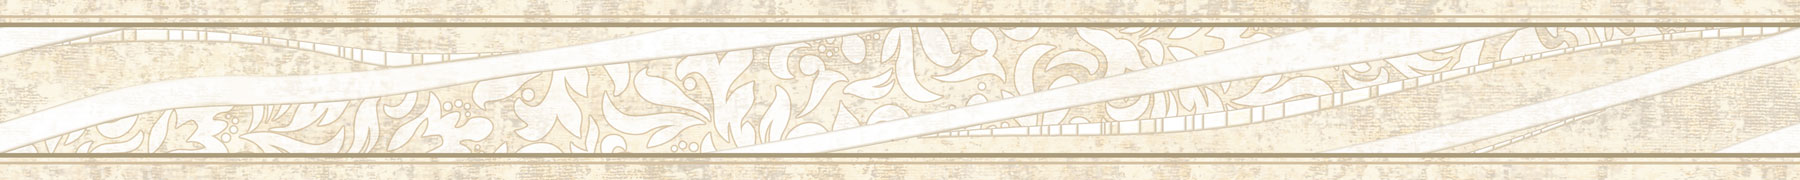 Бордюр настенный (60x600x9) Tario